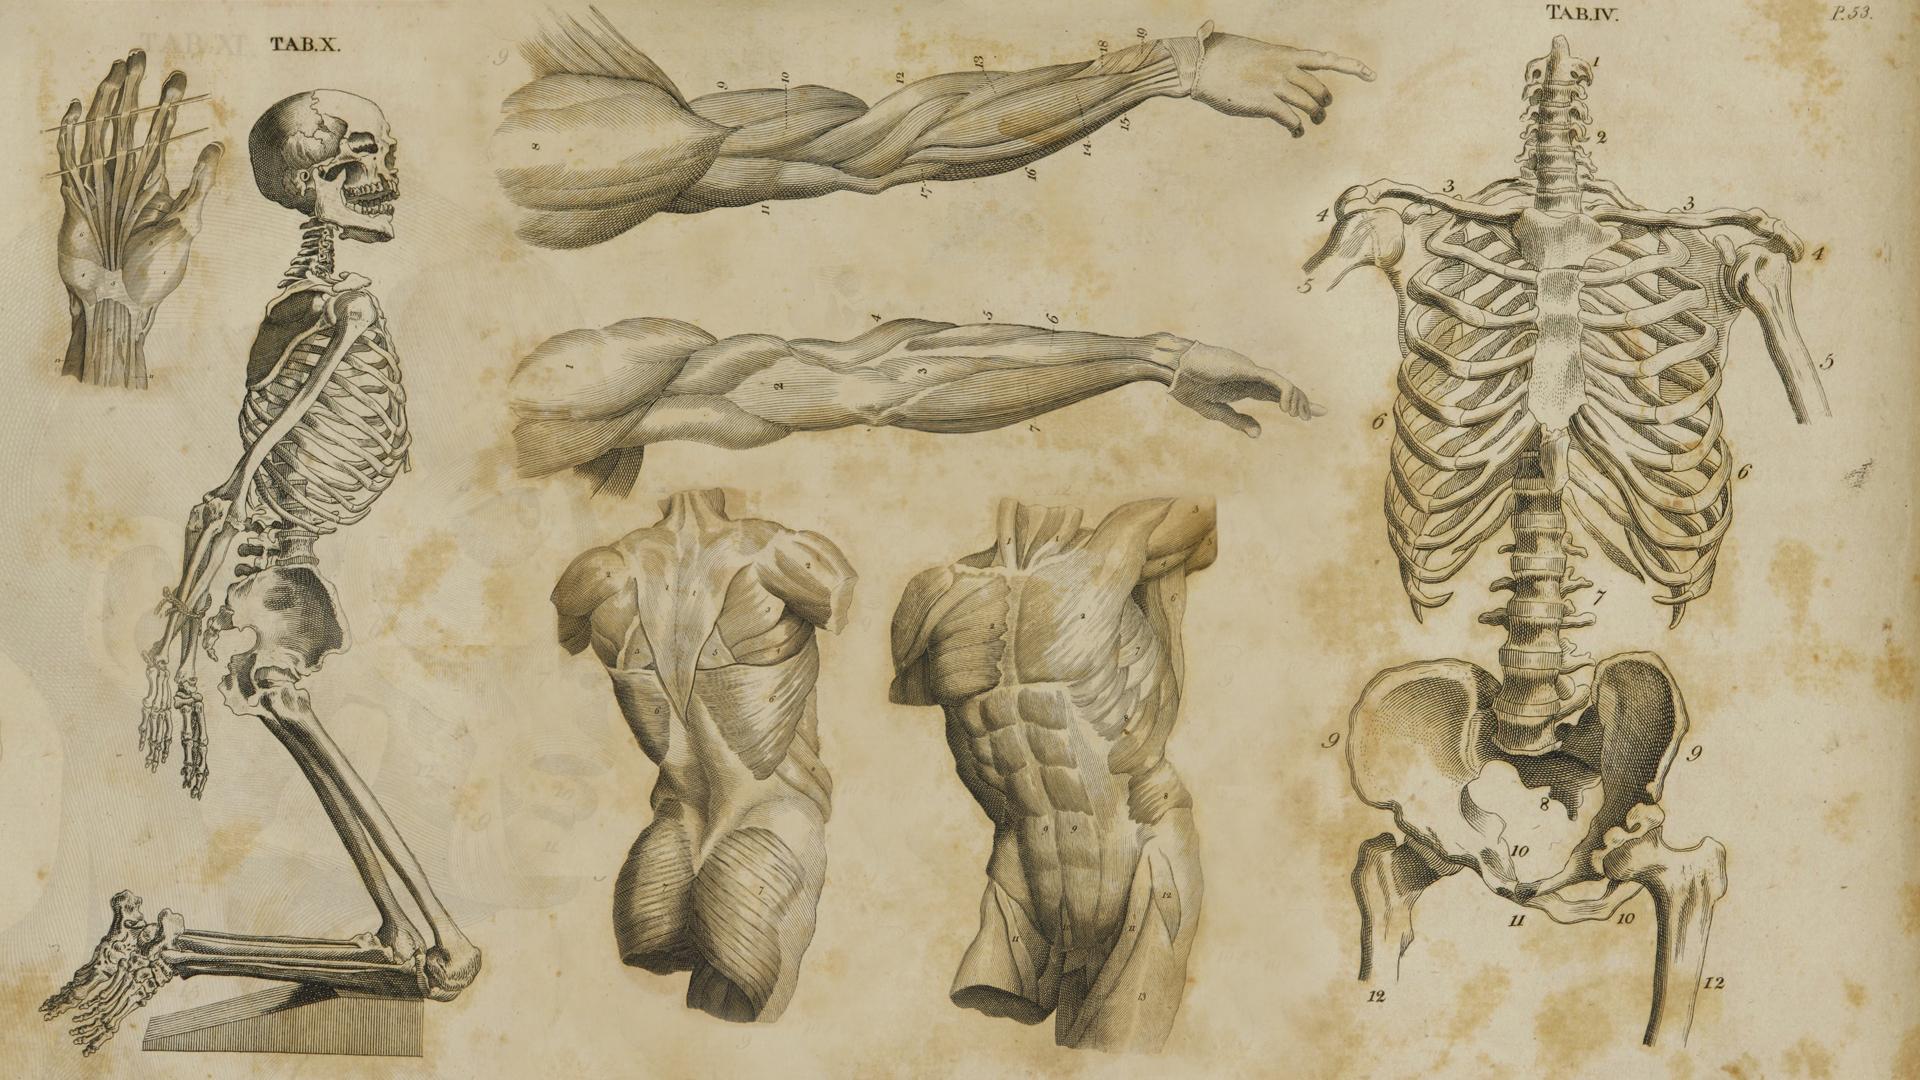 s-Anatomy-by-JasonMonteCarlo-deviantart-com-on-deviantART-wallpaper-wpc920560